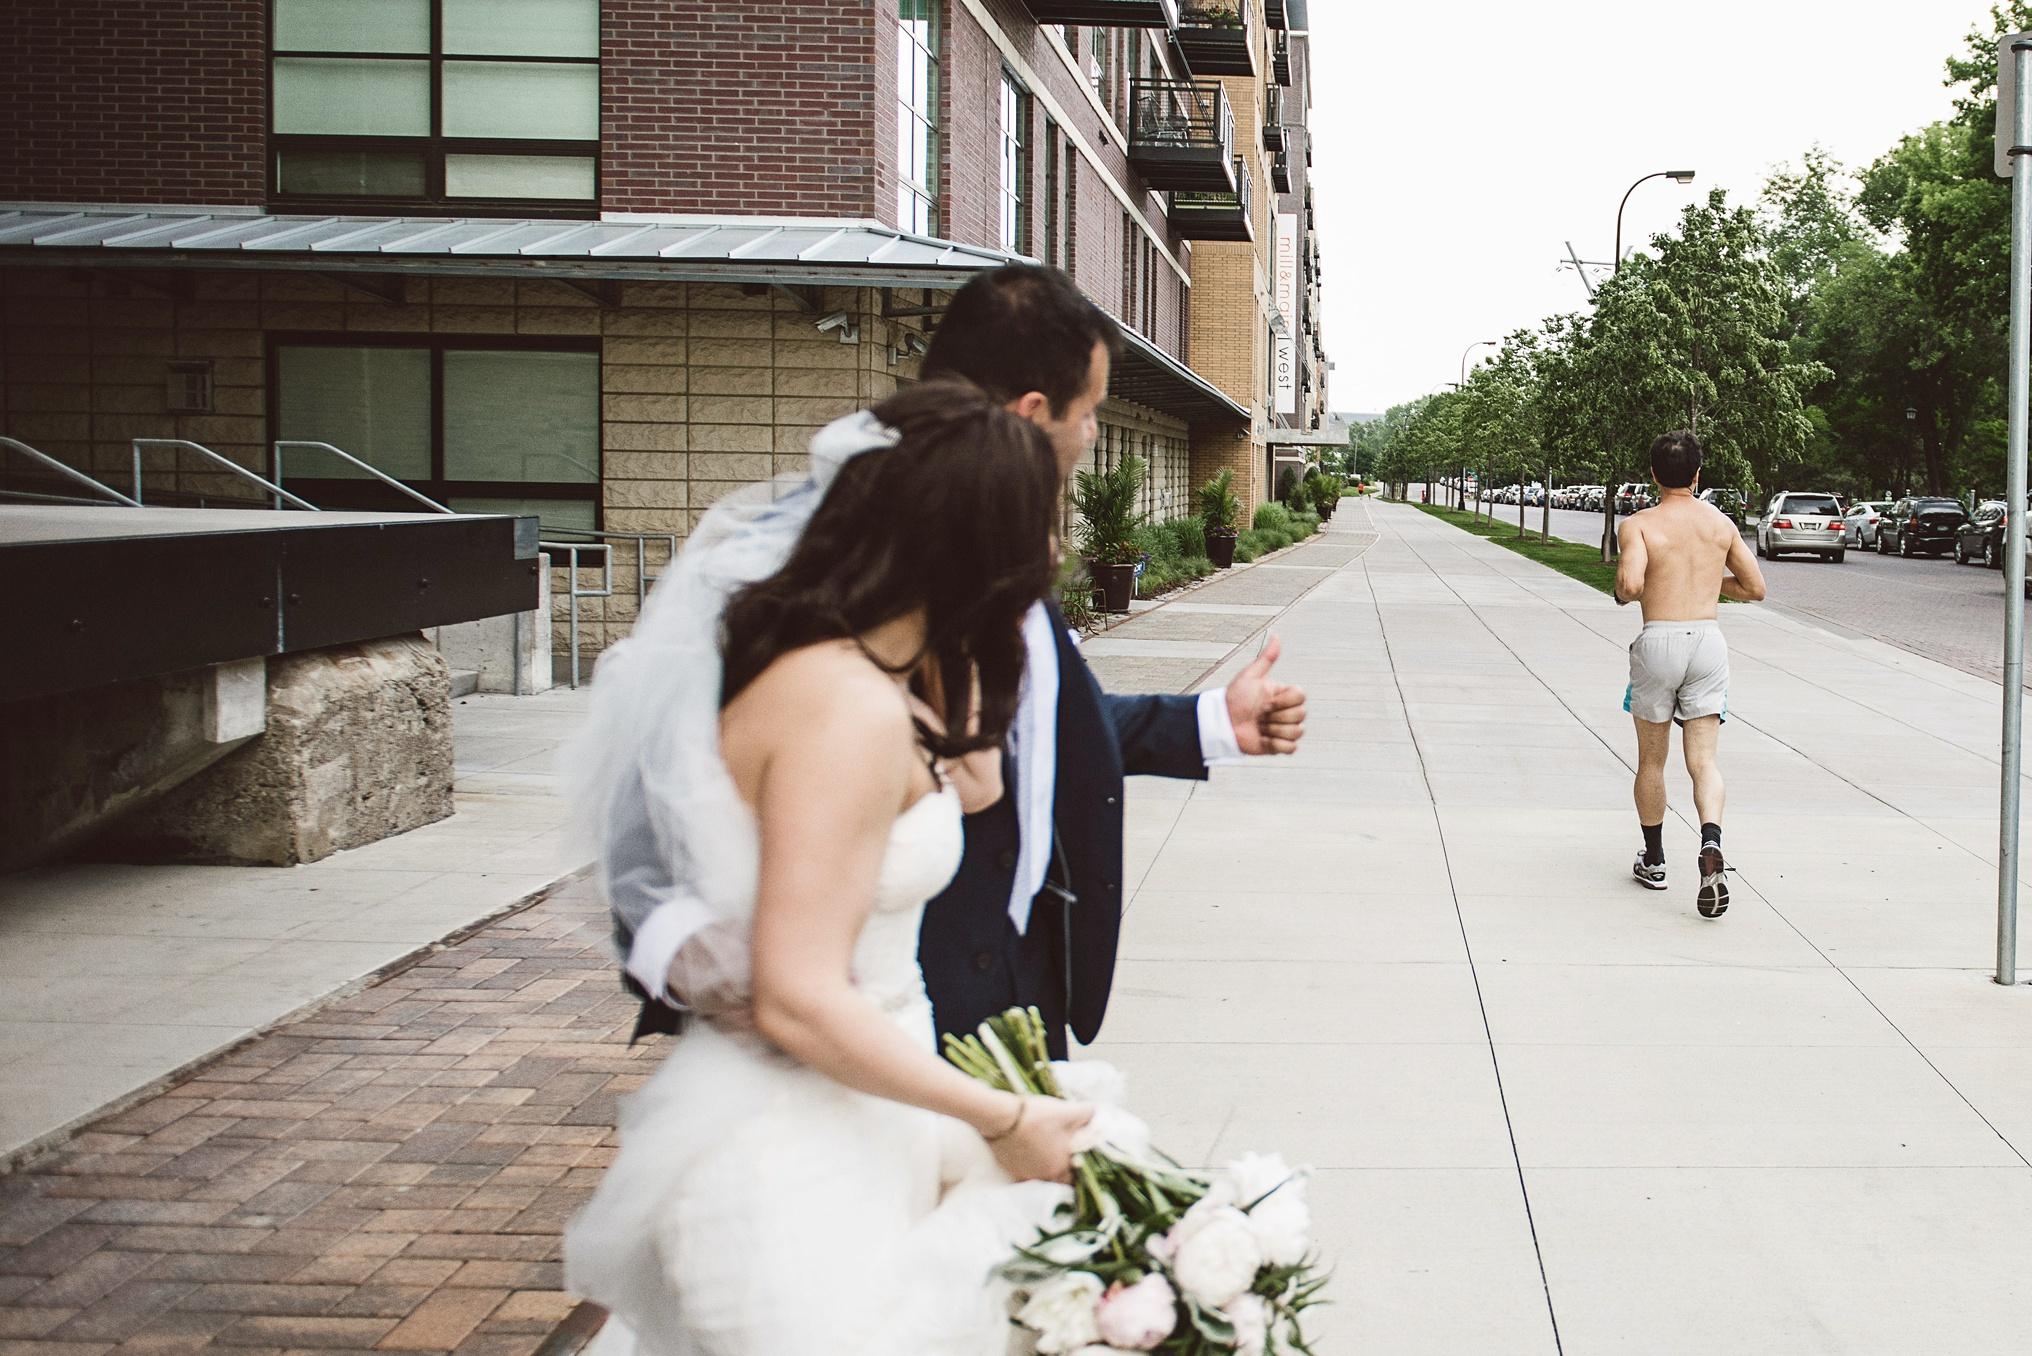 best_wedding_photography_2017_by_lucas_botz_photography_238.jpg